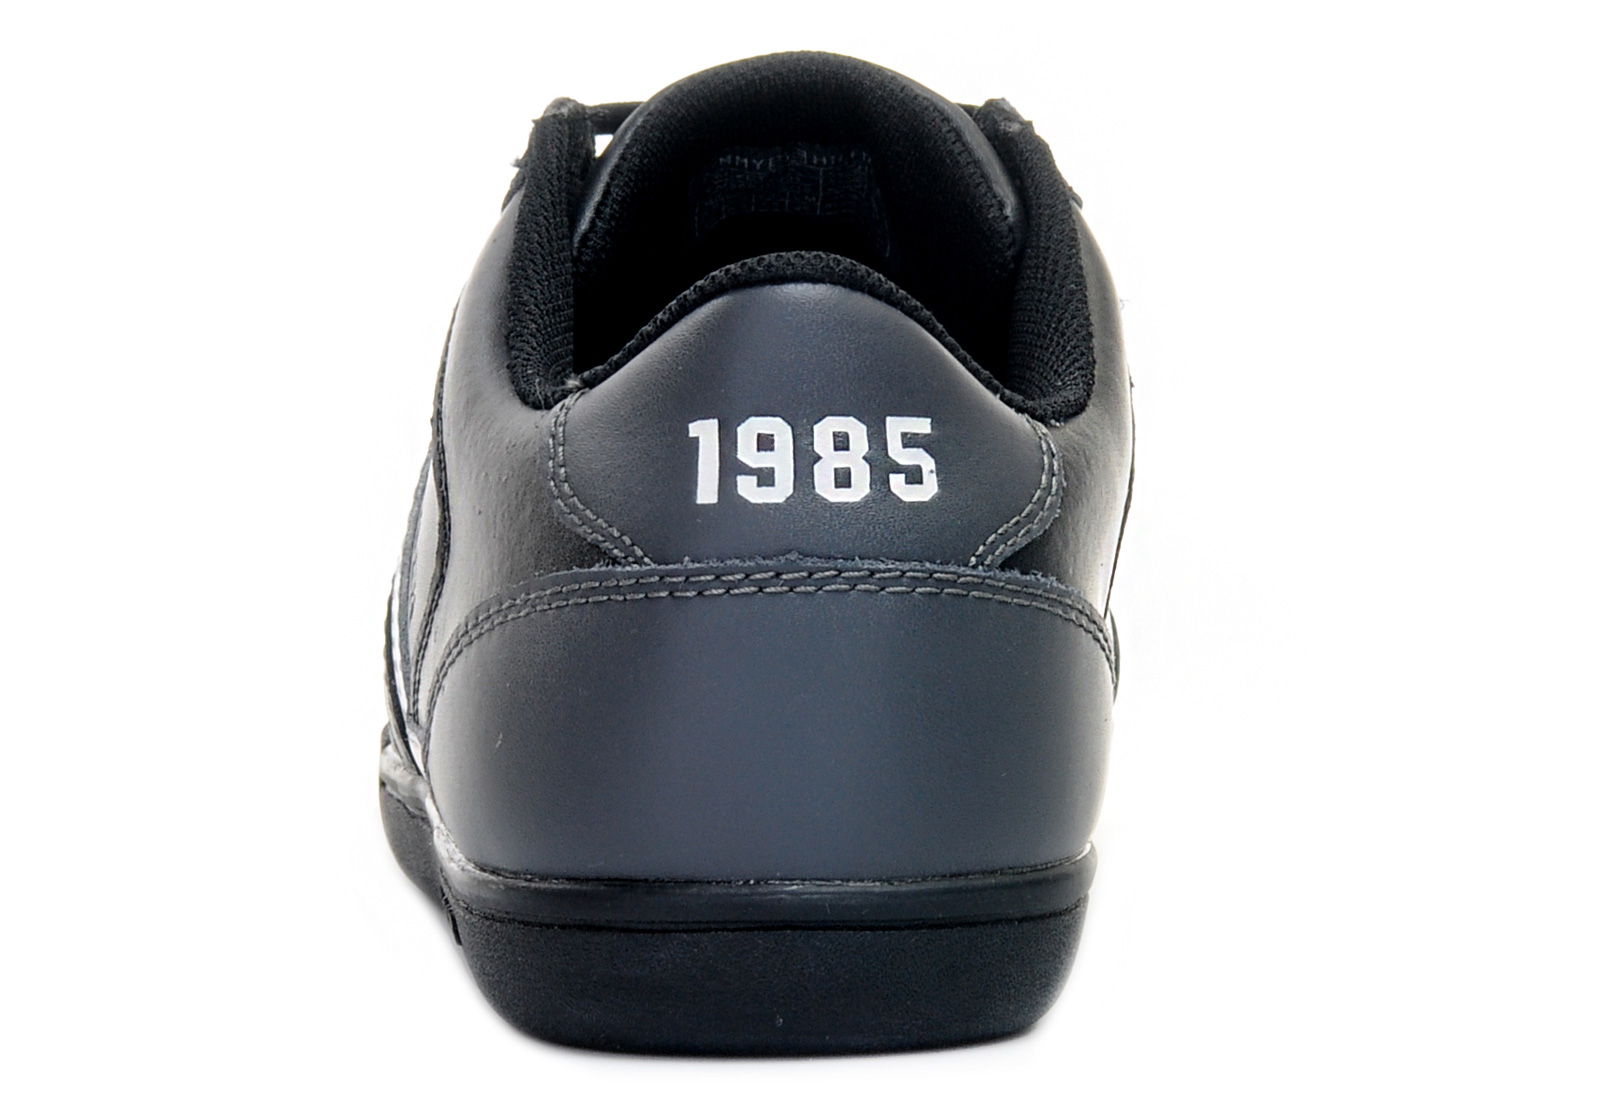 Tommy Hilfiger Cipő - Rickey 1a - 13f-6201-990 - Office Shoes ... 39009c0421